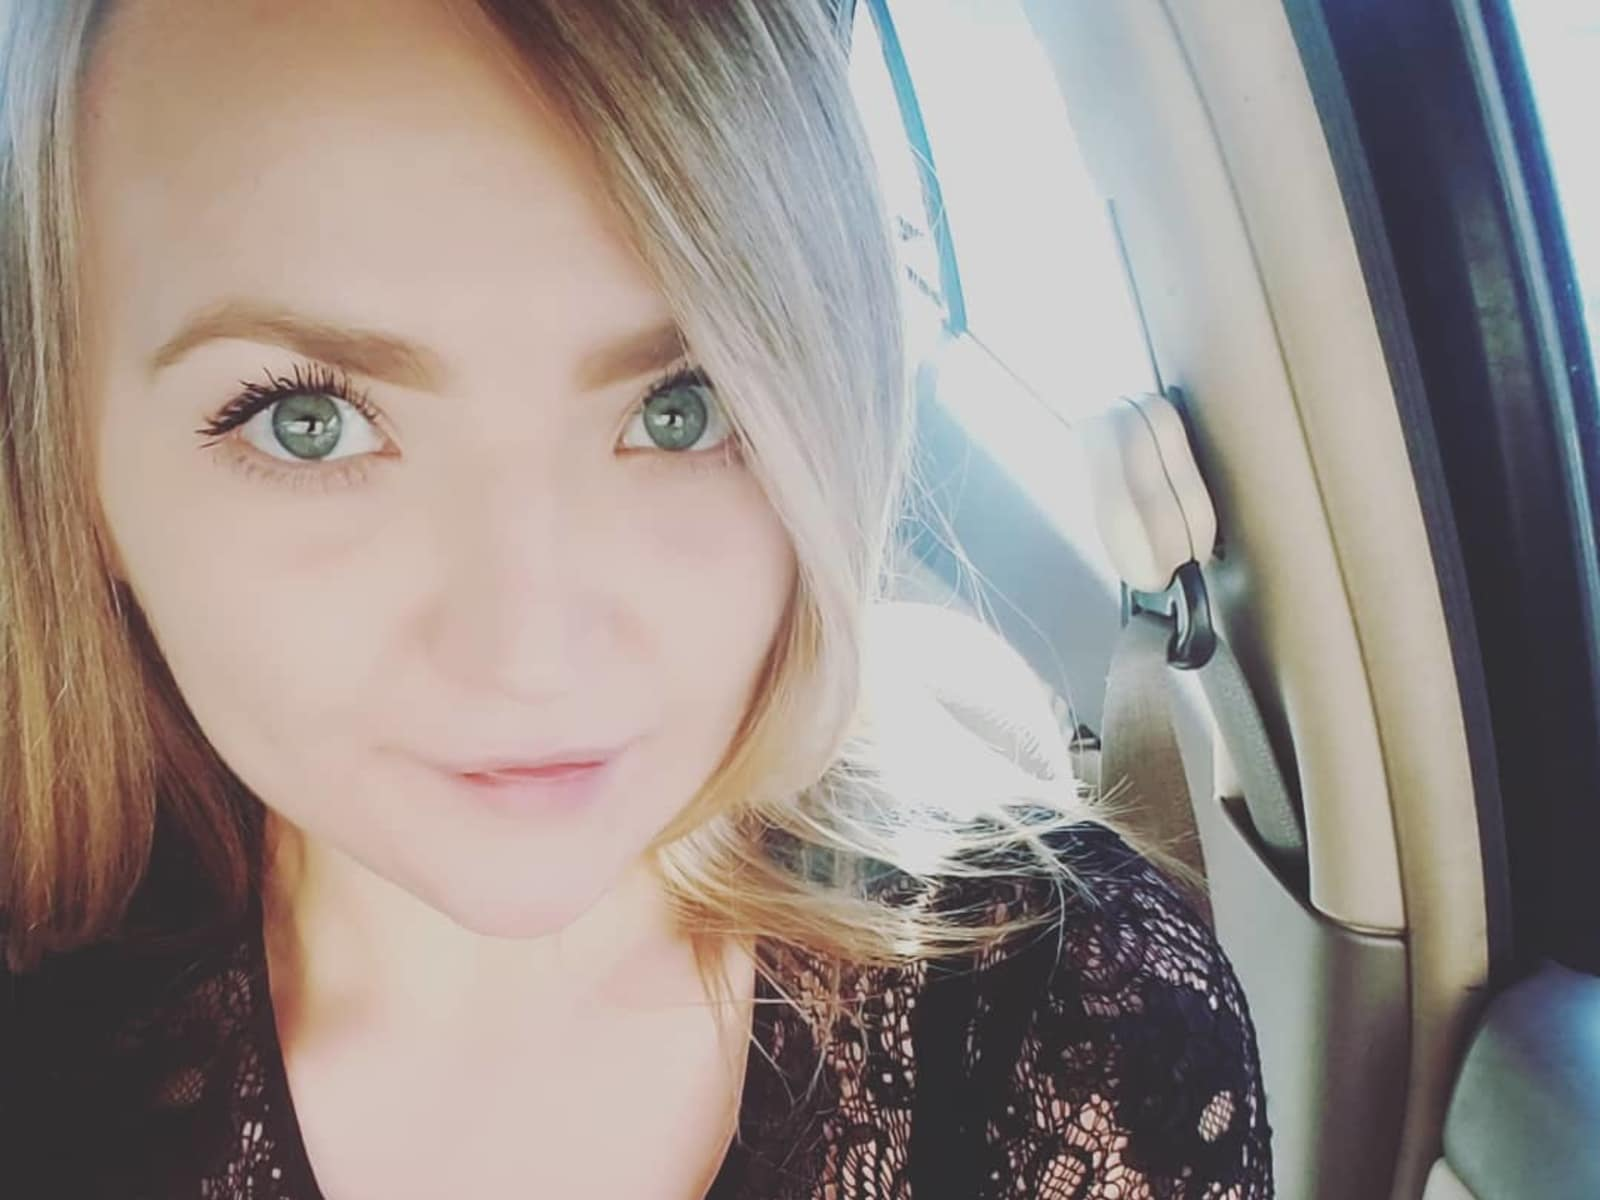 Rebekah from Denver, Colorado, United States